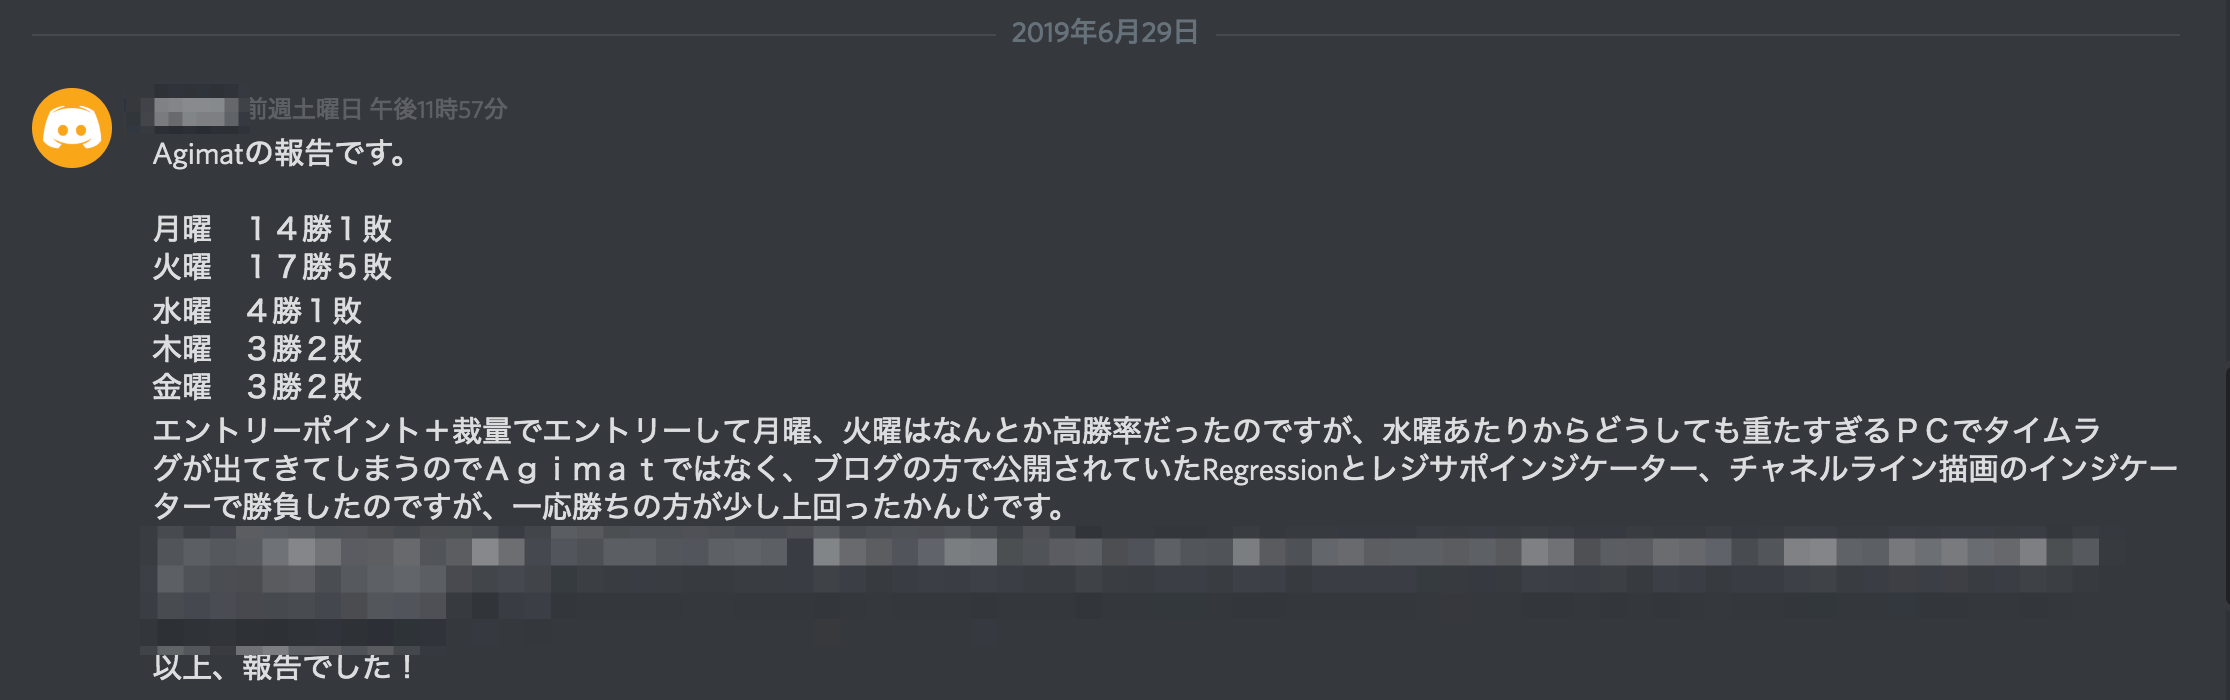 Binary Option(バイナリーオプション) Agimat